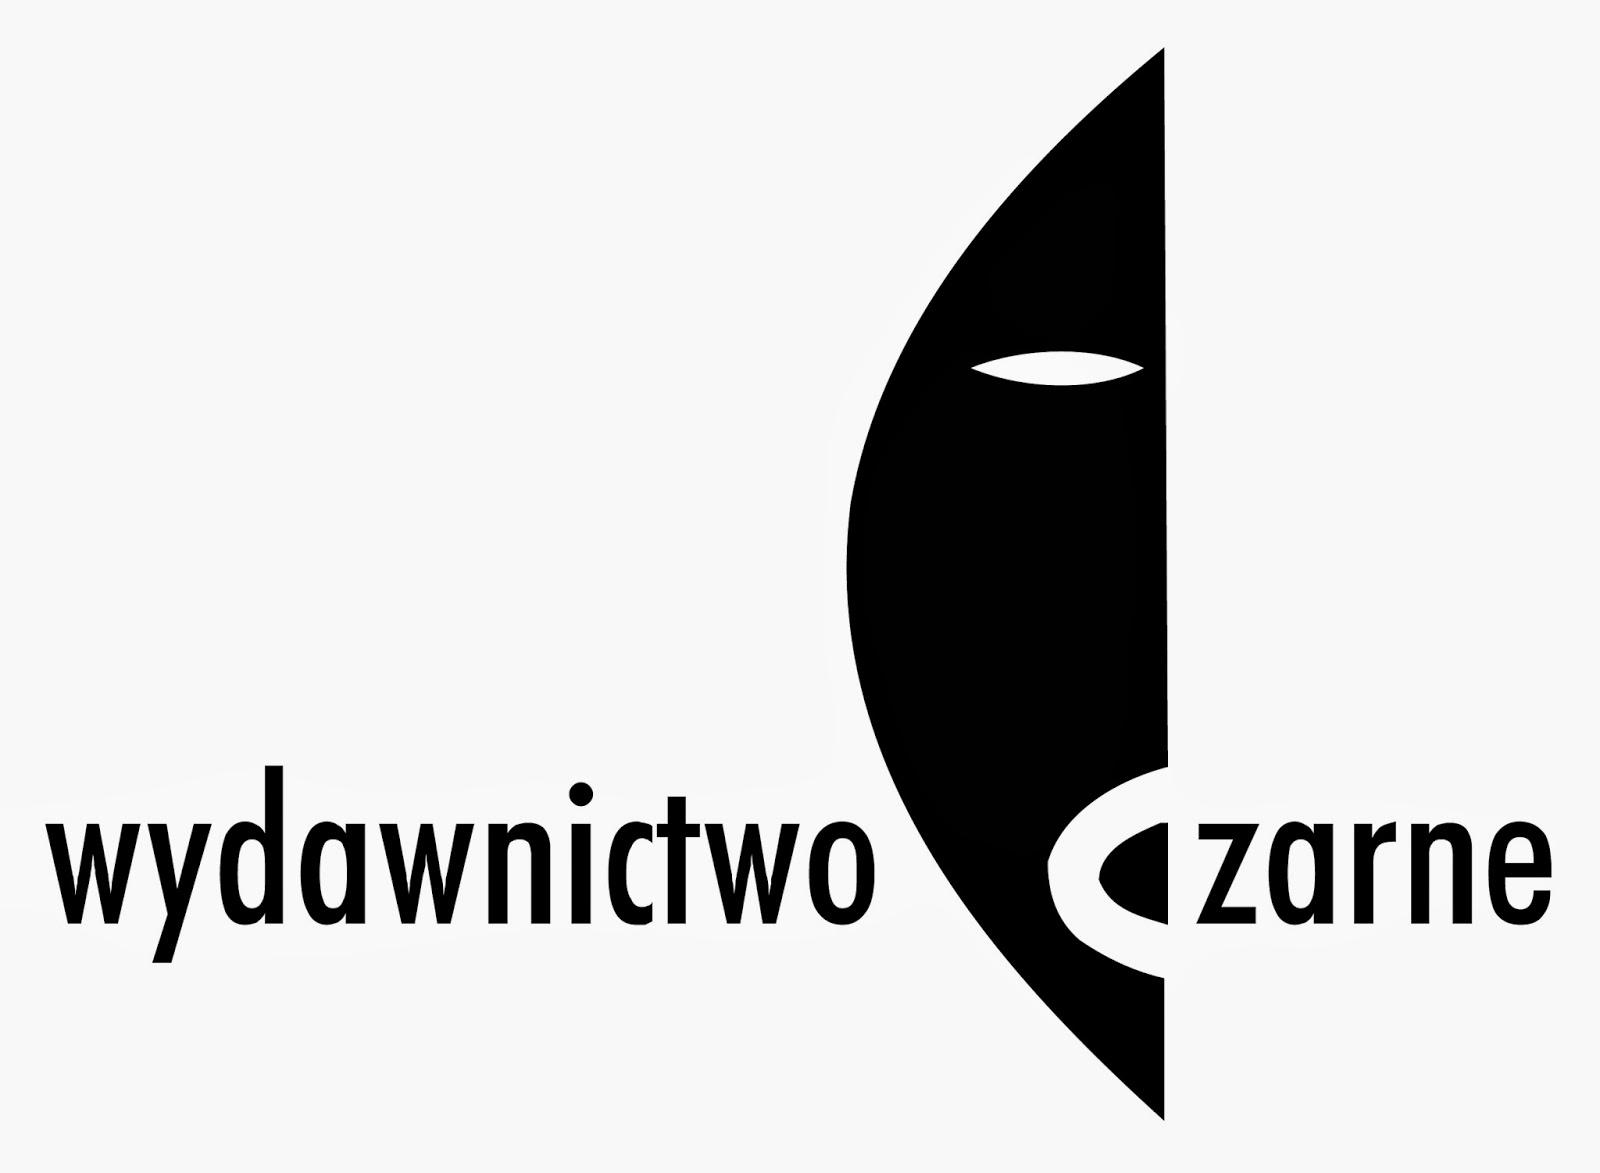 http://czarne.com.pl